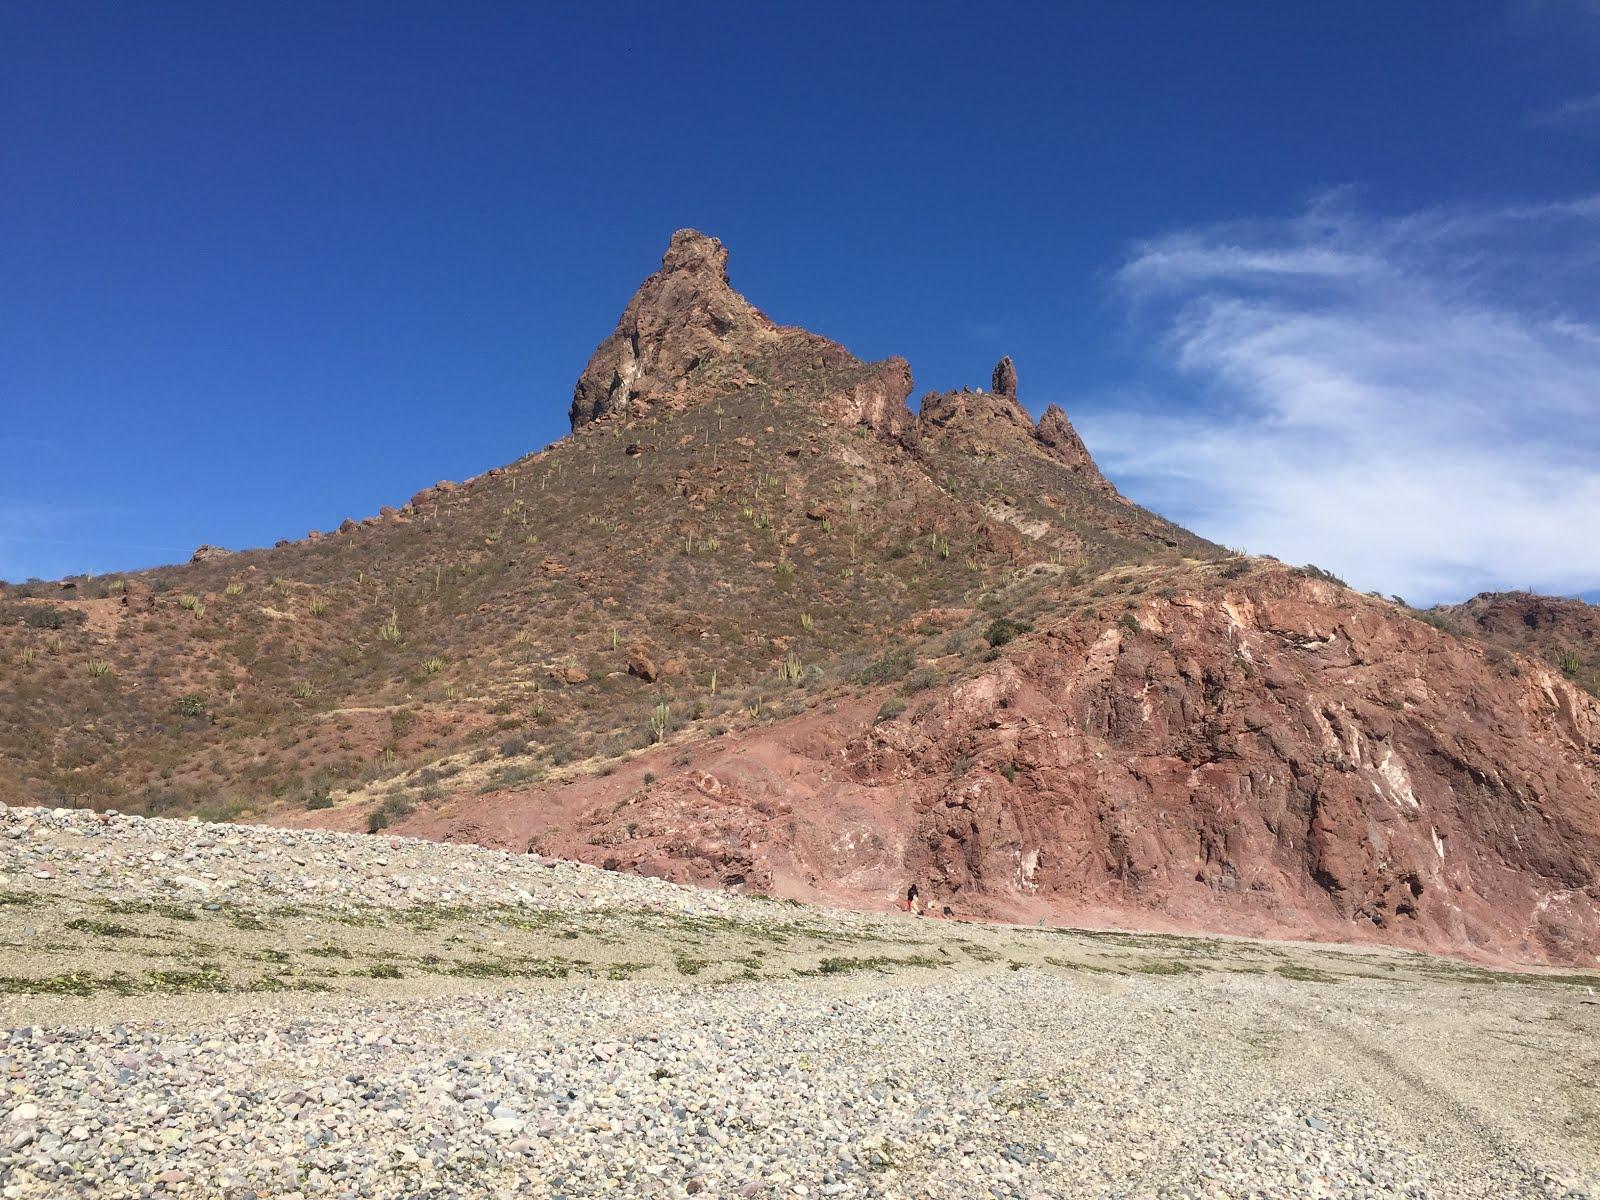 le cerro tetakawi à san carlos au mexique